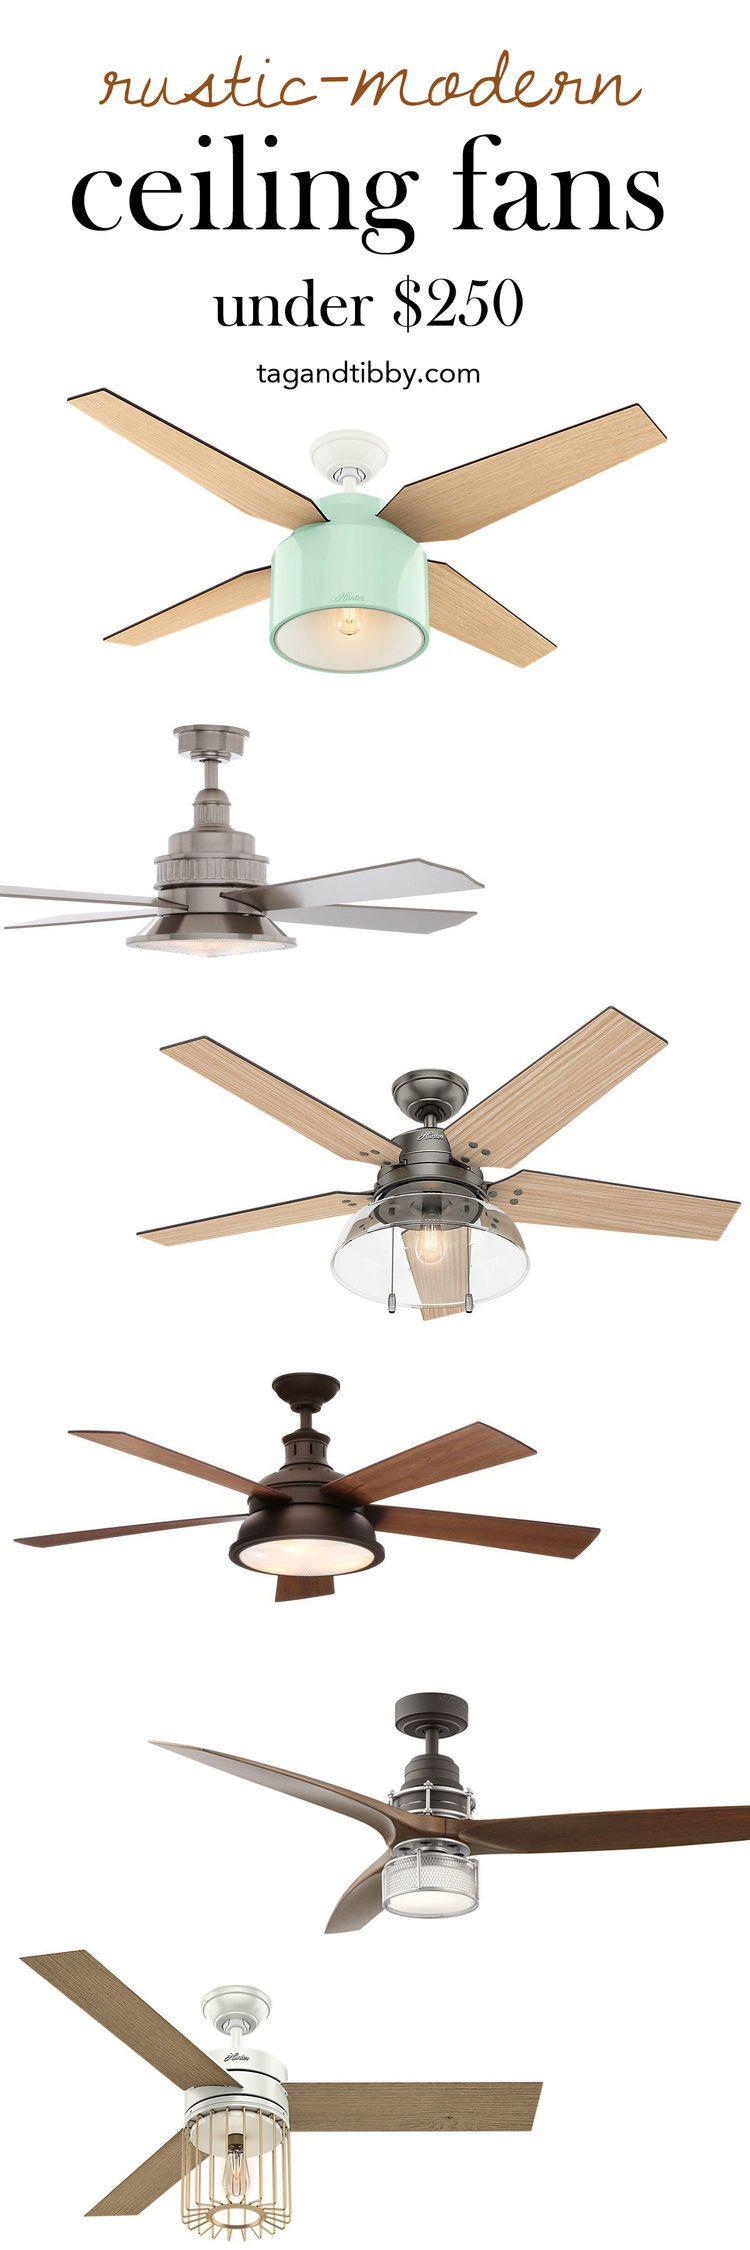 8 ModernRustic Ceiling Fans for Under 250 Ceiling fan